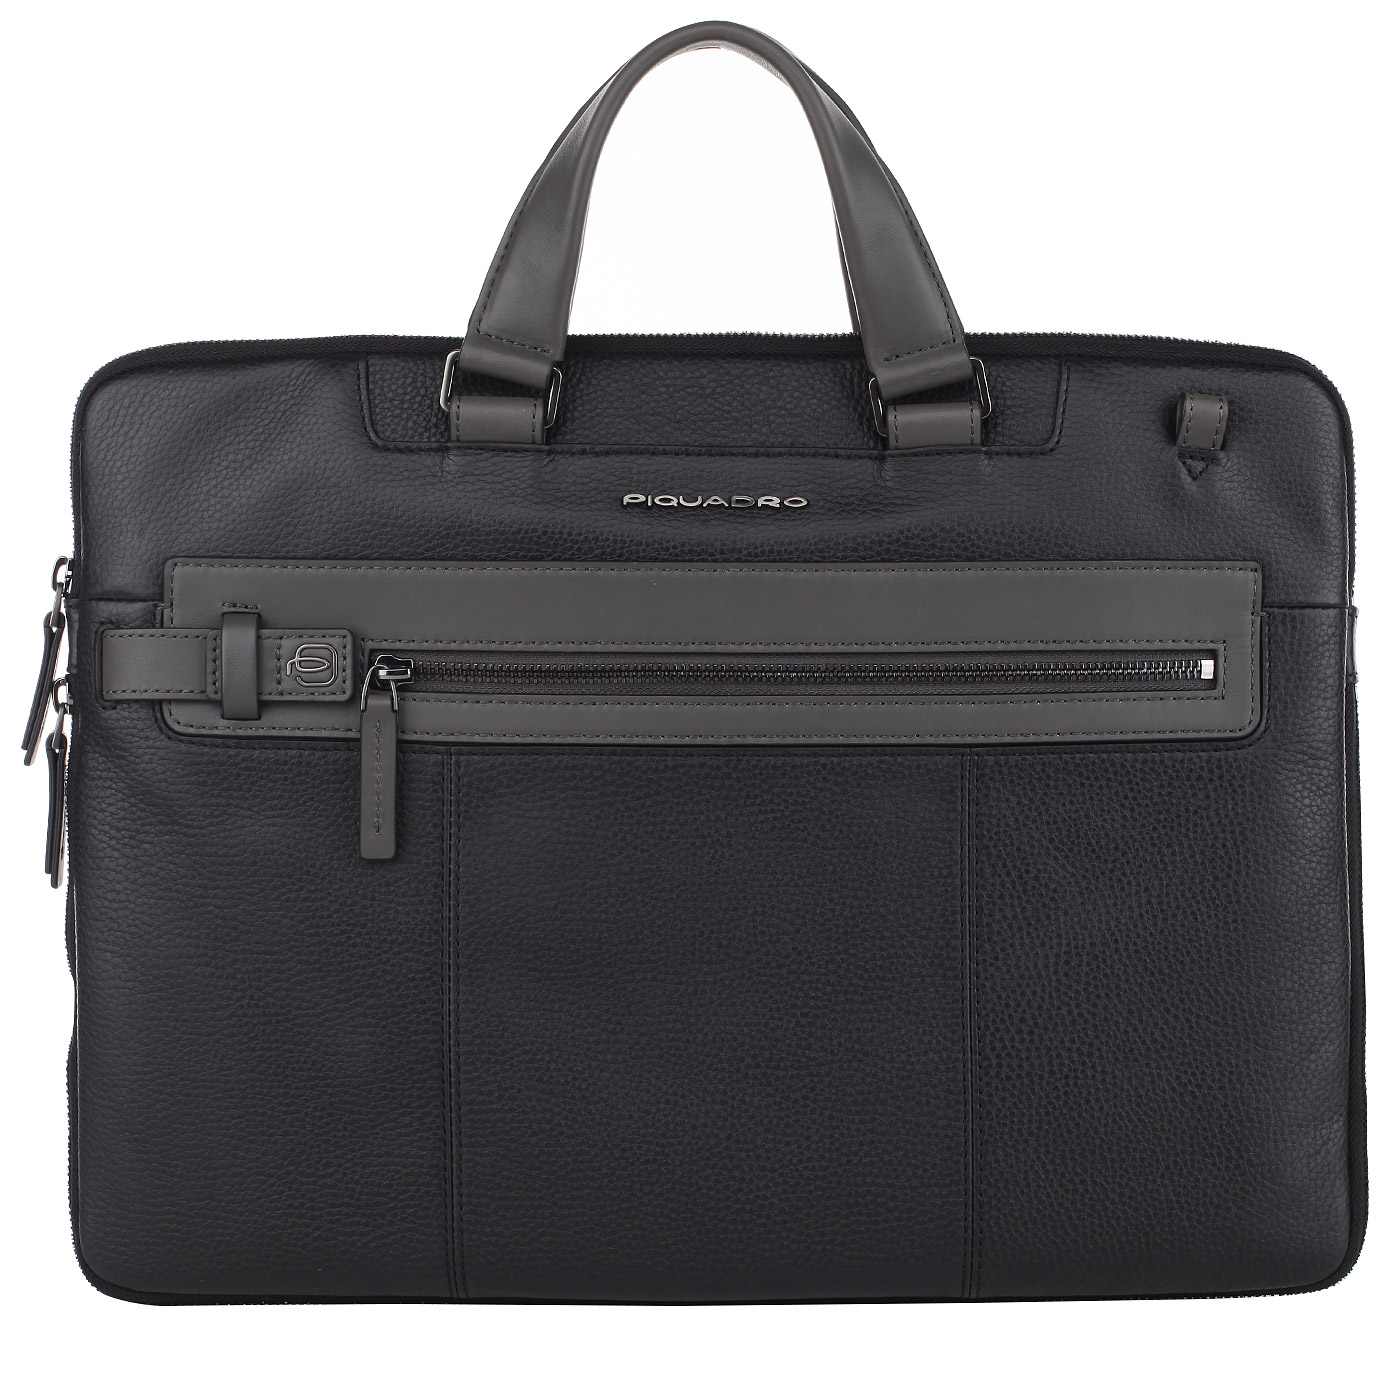 47622d660e49 Мужская деловая сумка из натуральной кожи Piquadro Scott CA4197W83/N ...